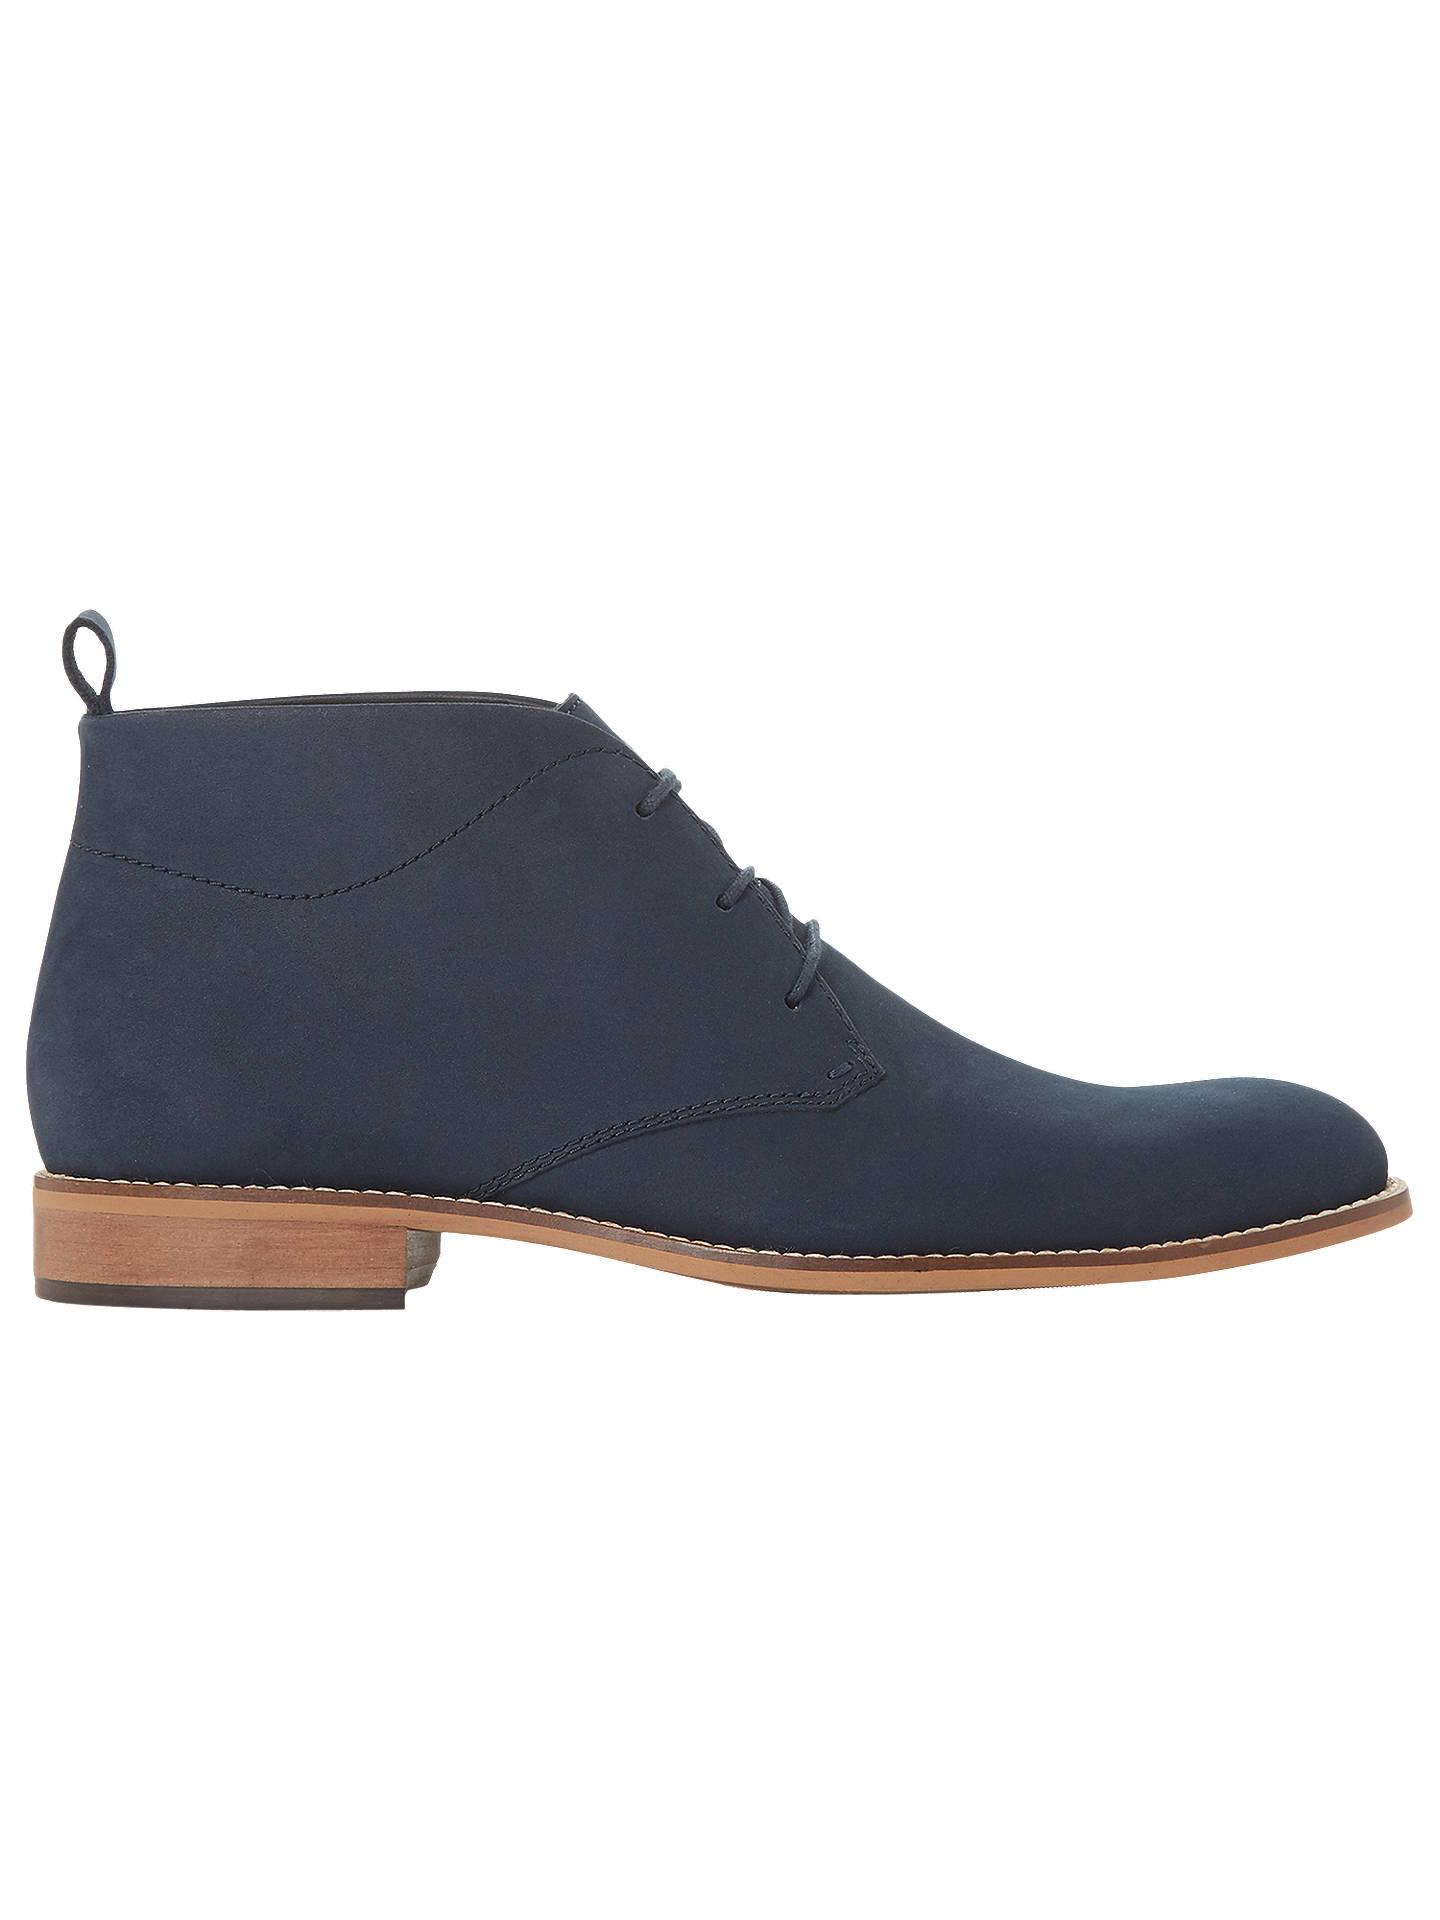 e130d1779ea685 Dune Messi Leather Chukka Boots at John Lewis   Partners